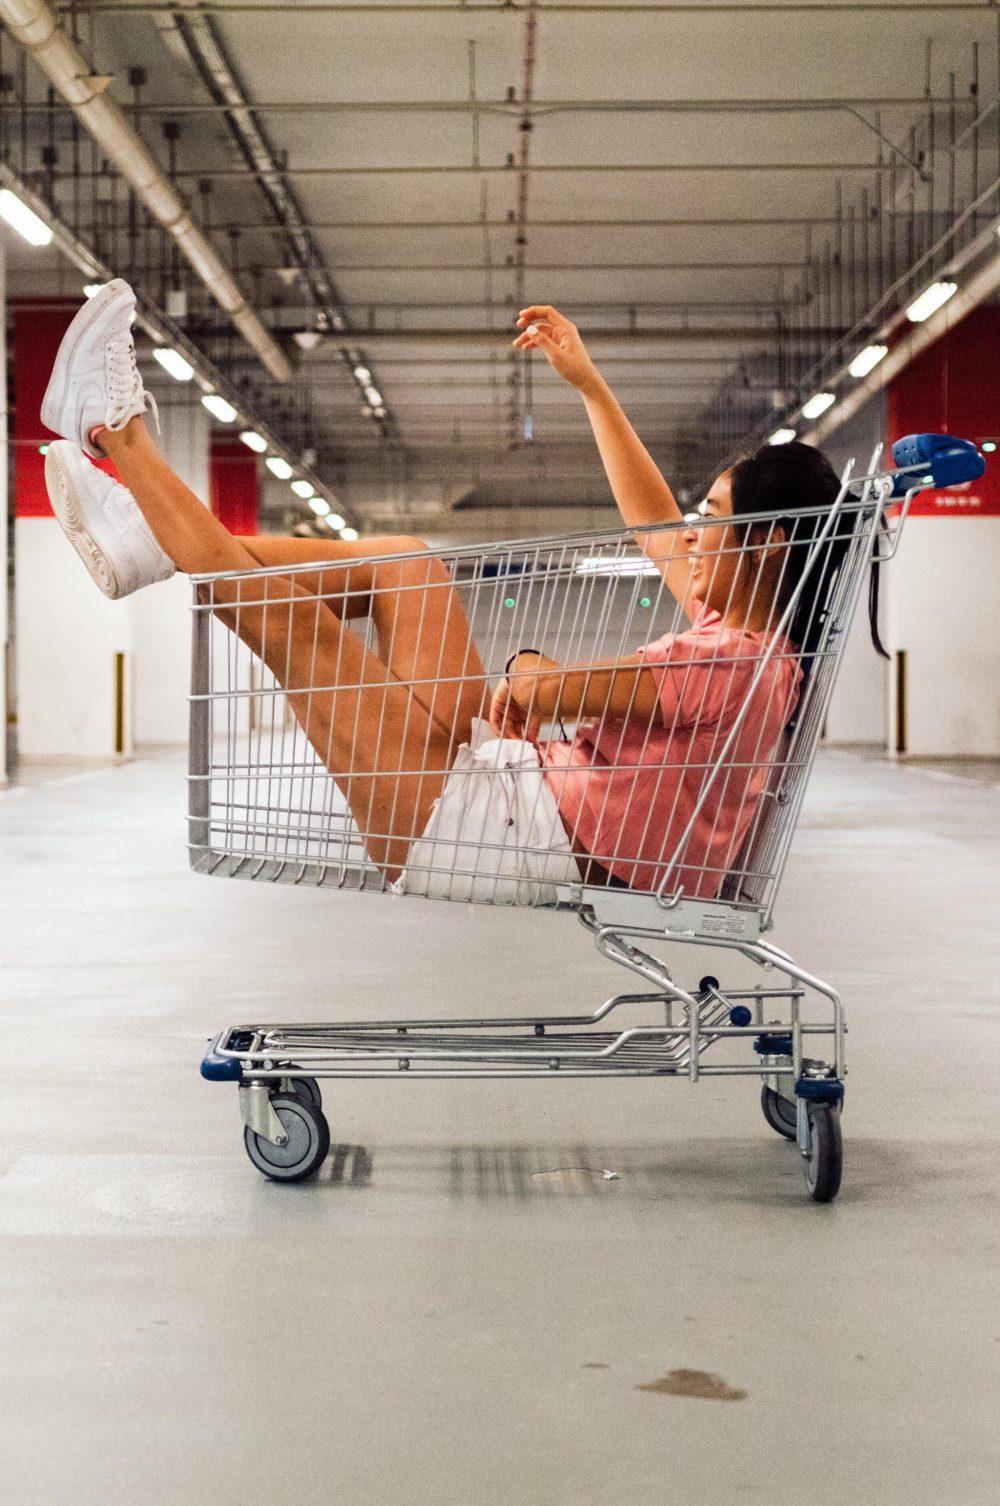 Retail's New Reality